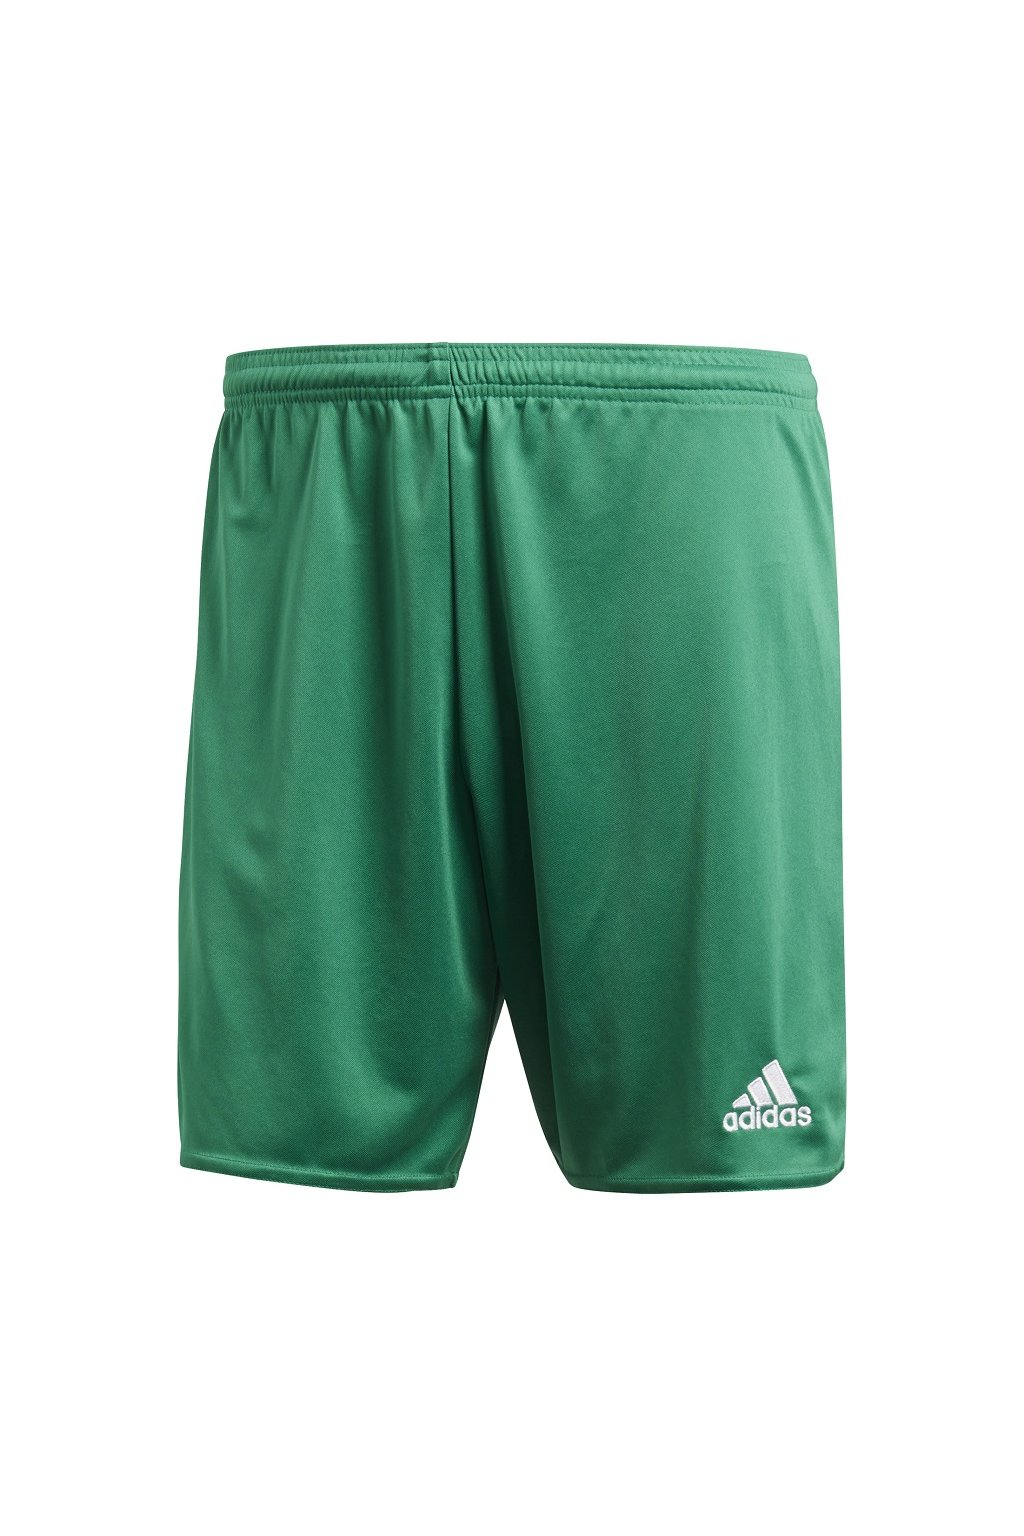 Detské kraťasy Adidas Parma 16 JUNIOR zelené AJ5884